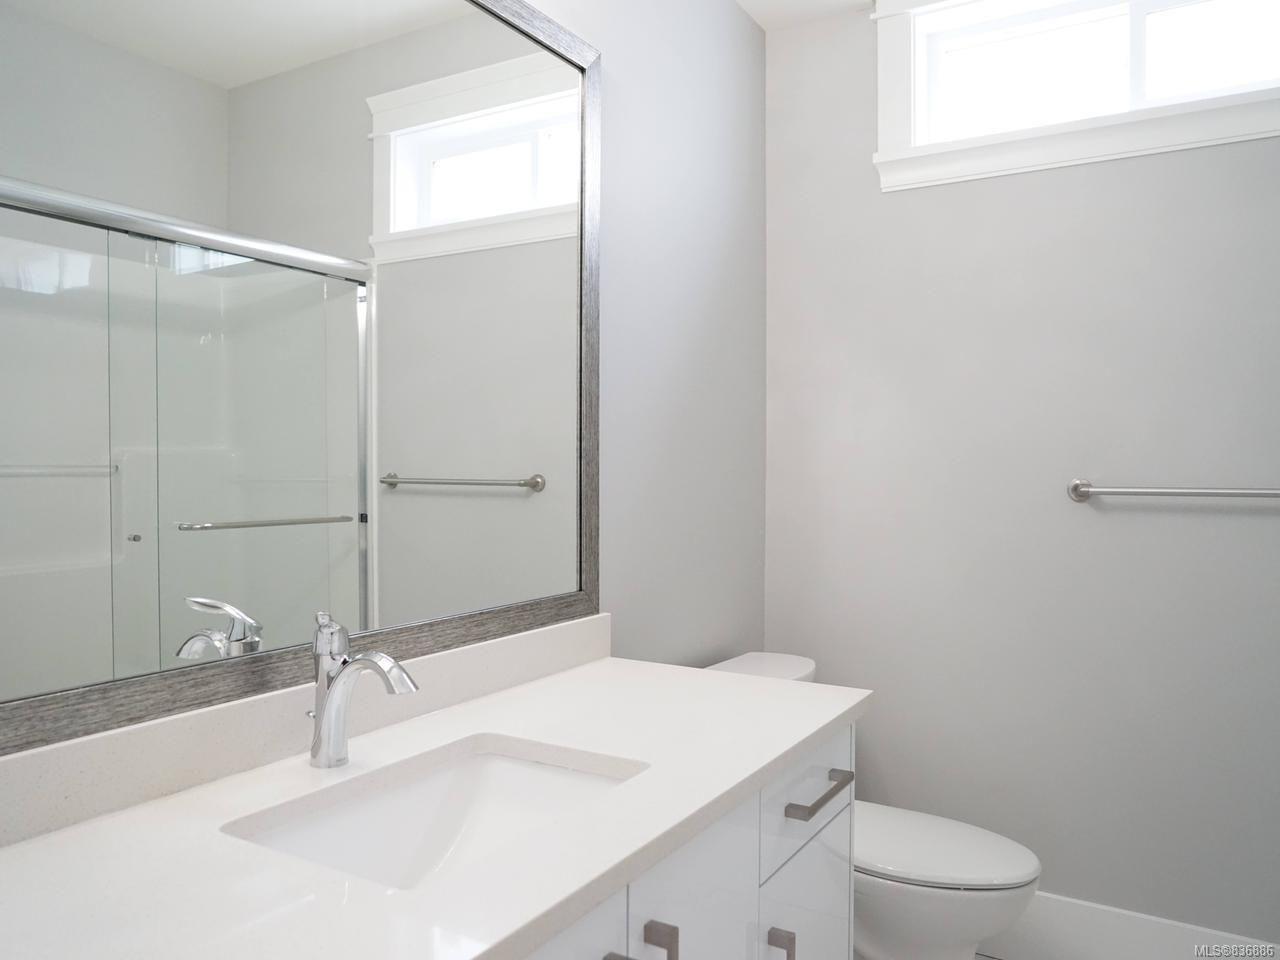 Photo 21: Photos: 123 Lindquist Rd in NANAIMO: Na North Nanaimo House for sale (Nanaimo)  : MLS®# 836886